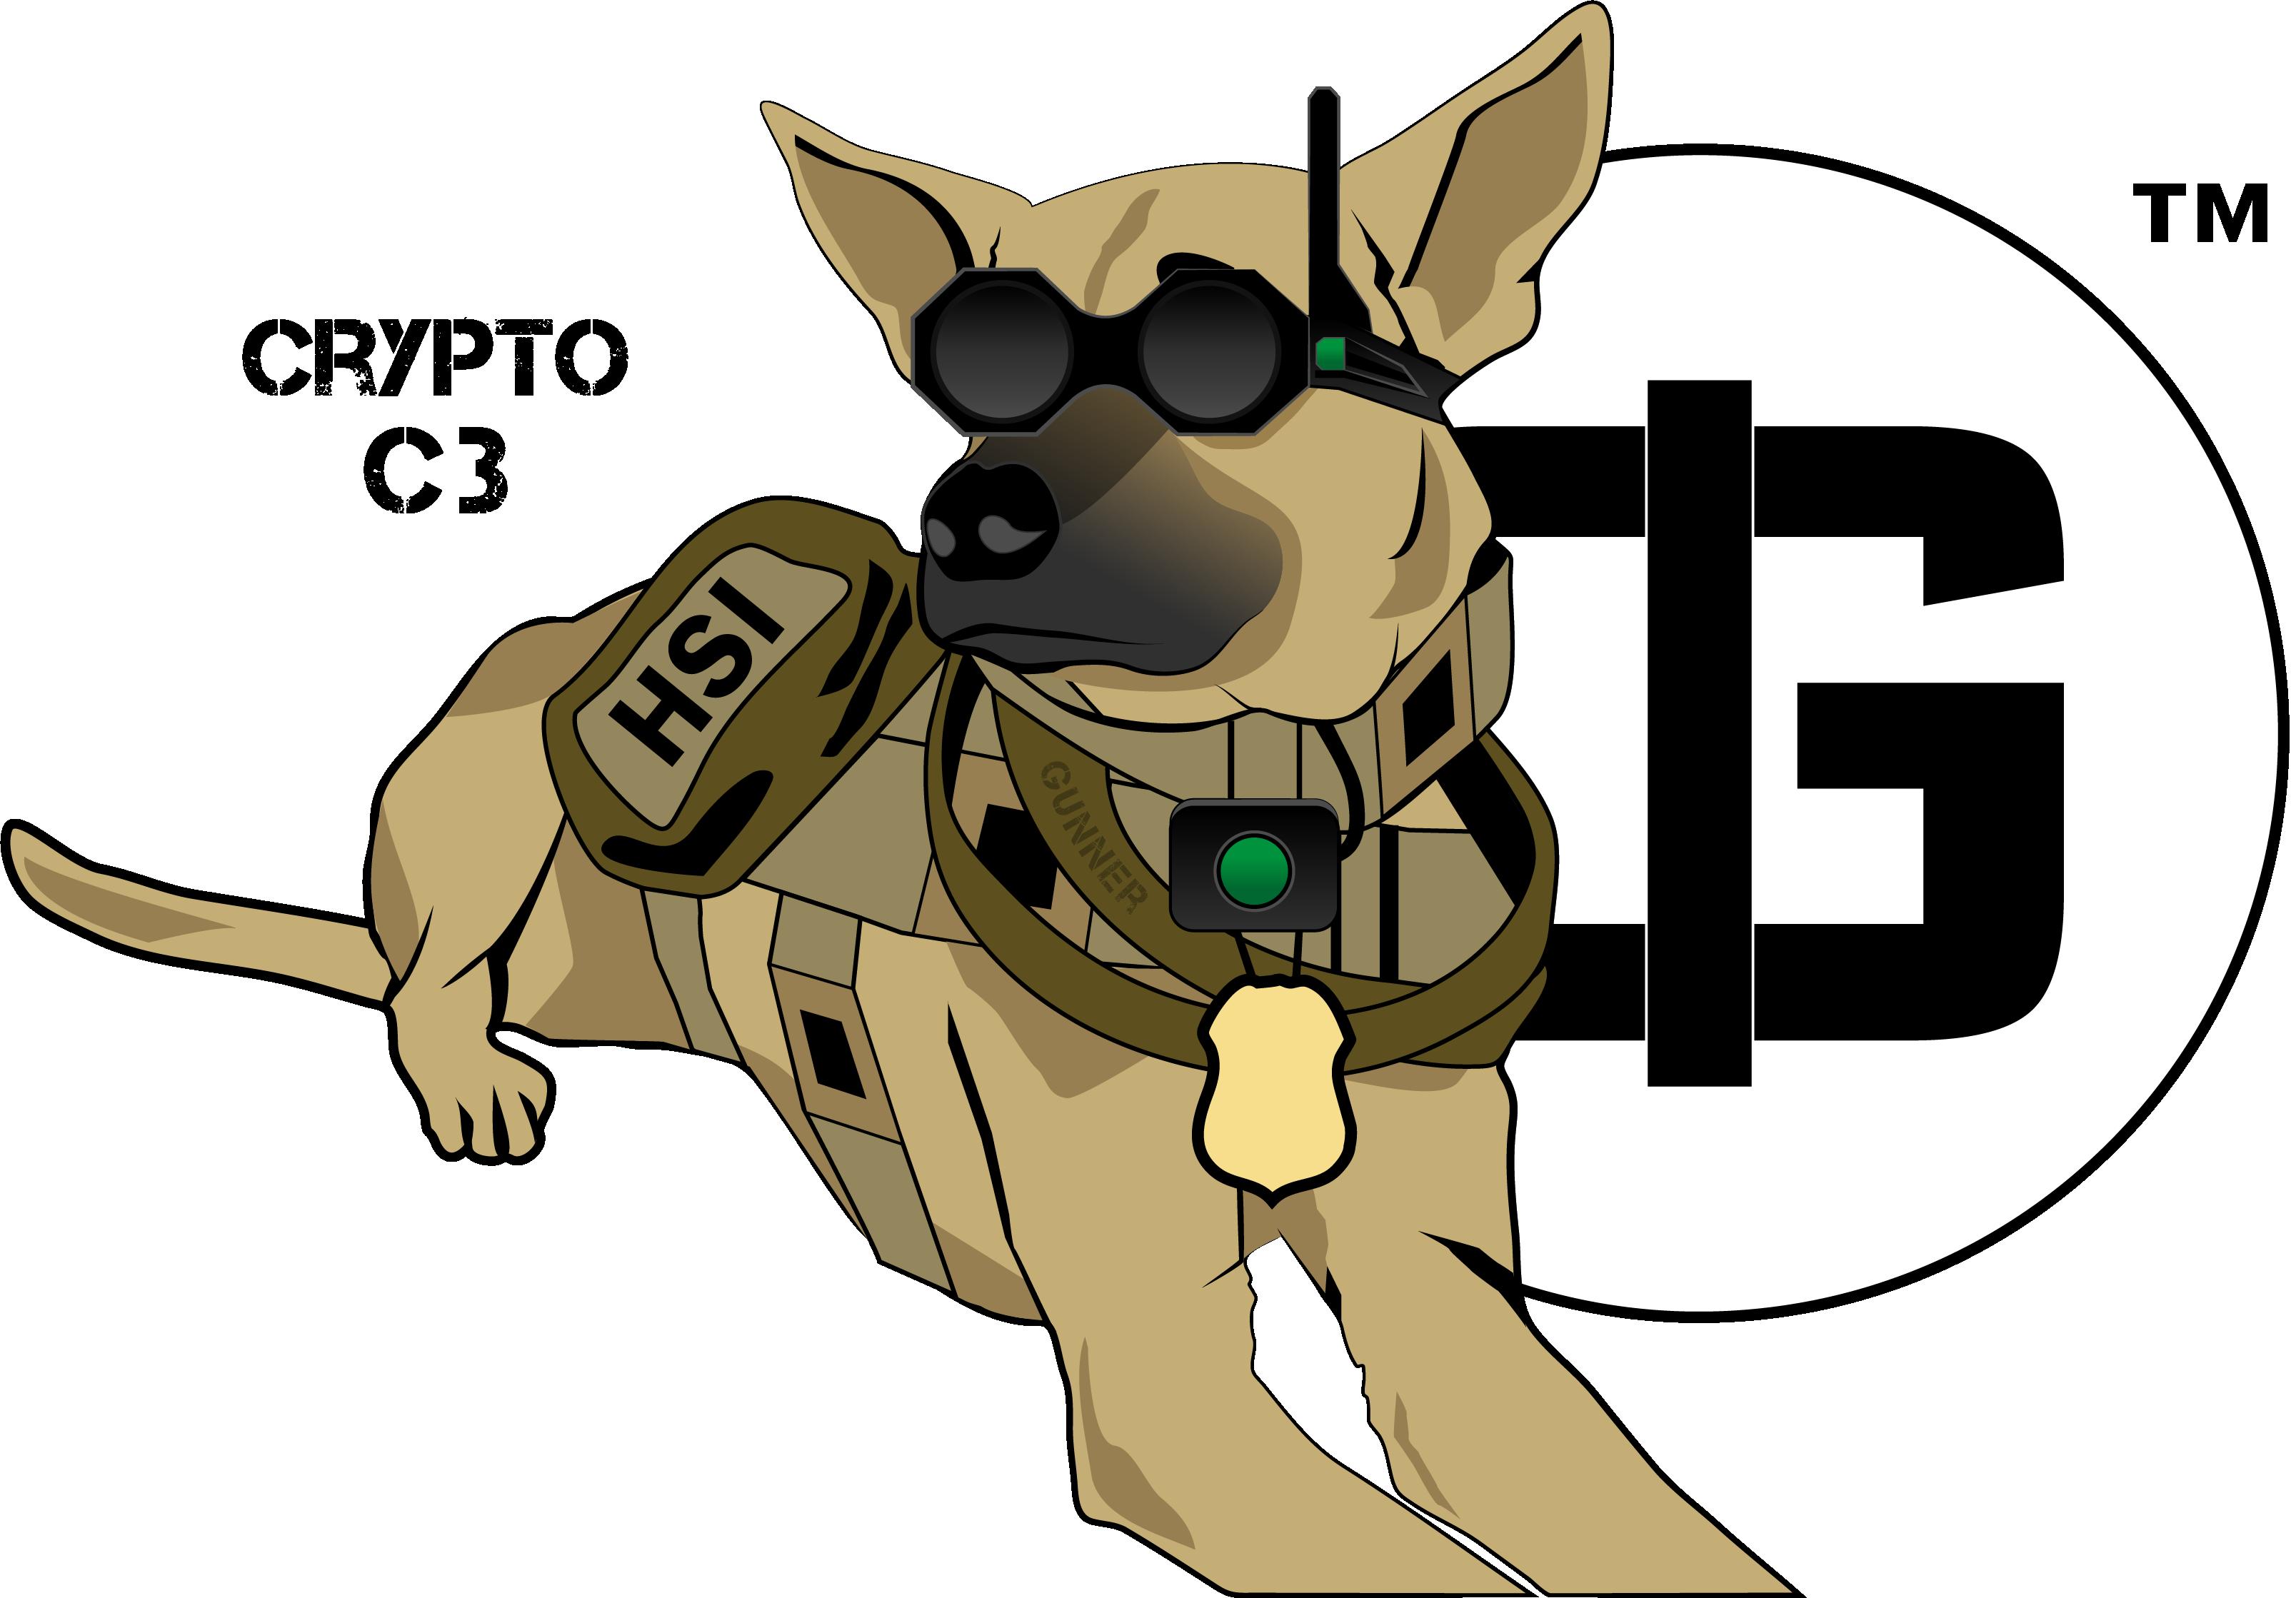 Crypto C3